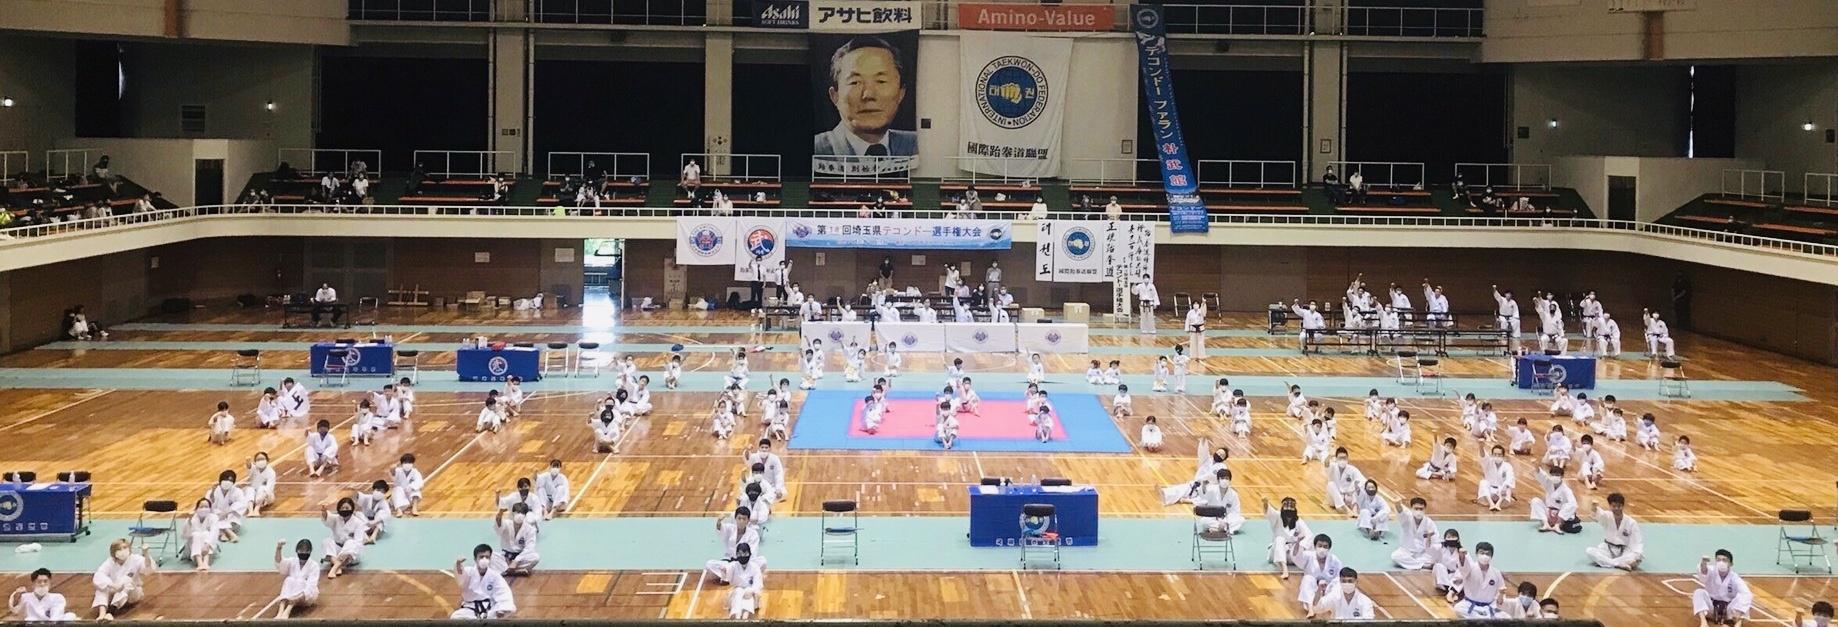 第18回埼玉県テコンドー選手権大会